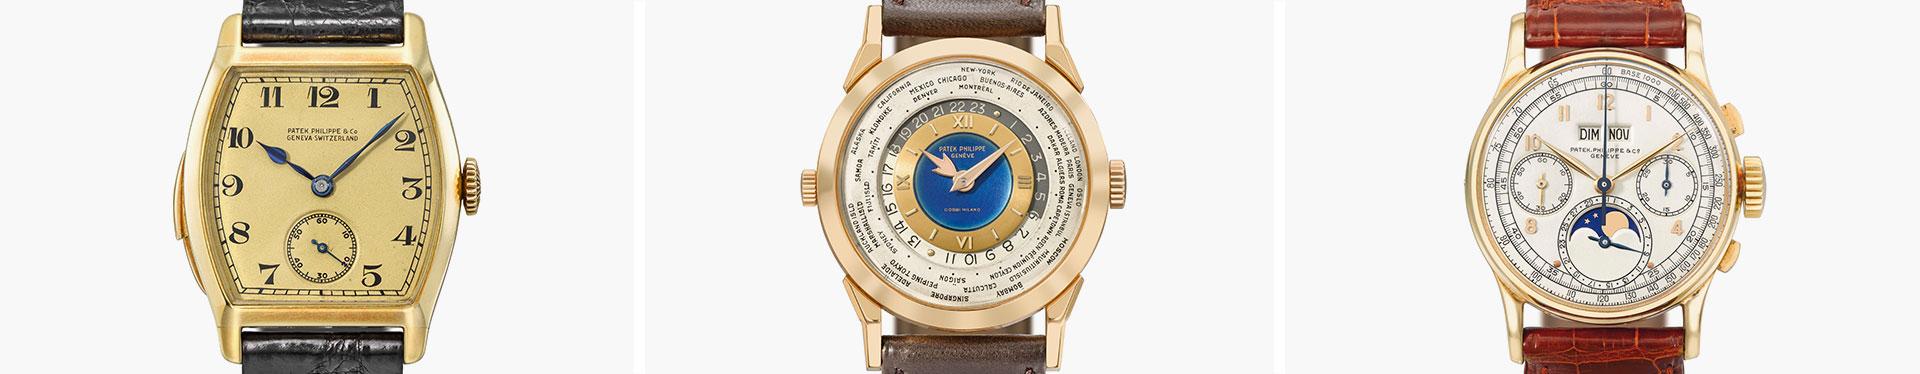 watch-department-banner-NEW-christies_60_1_20191218161101.jpg